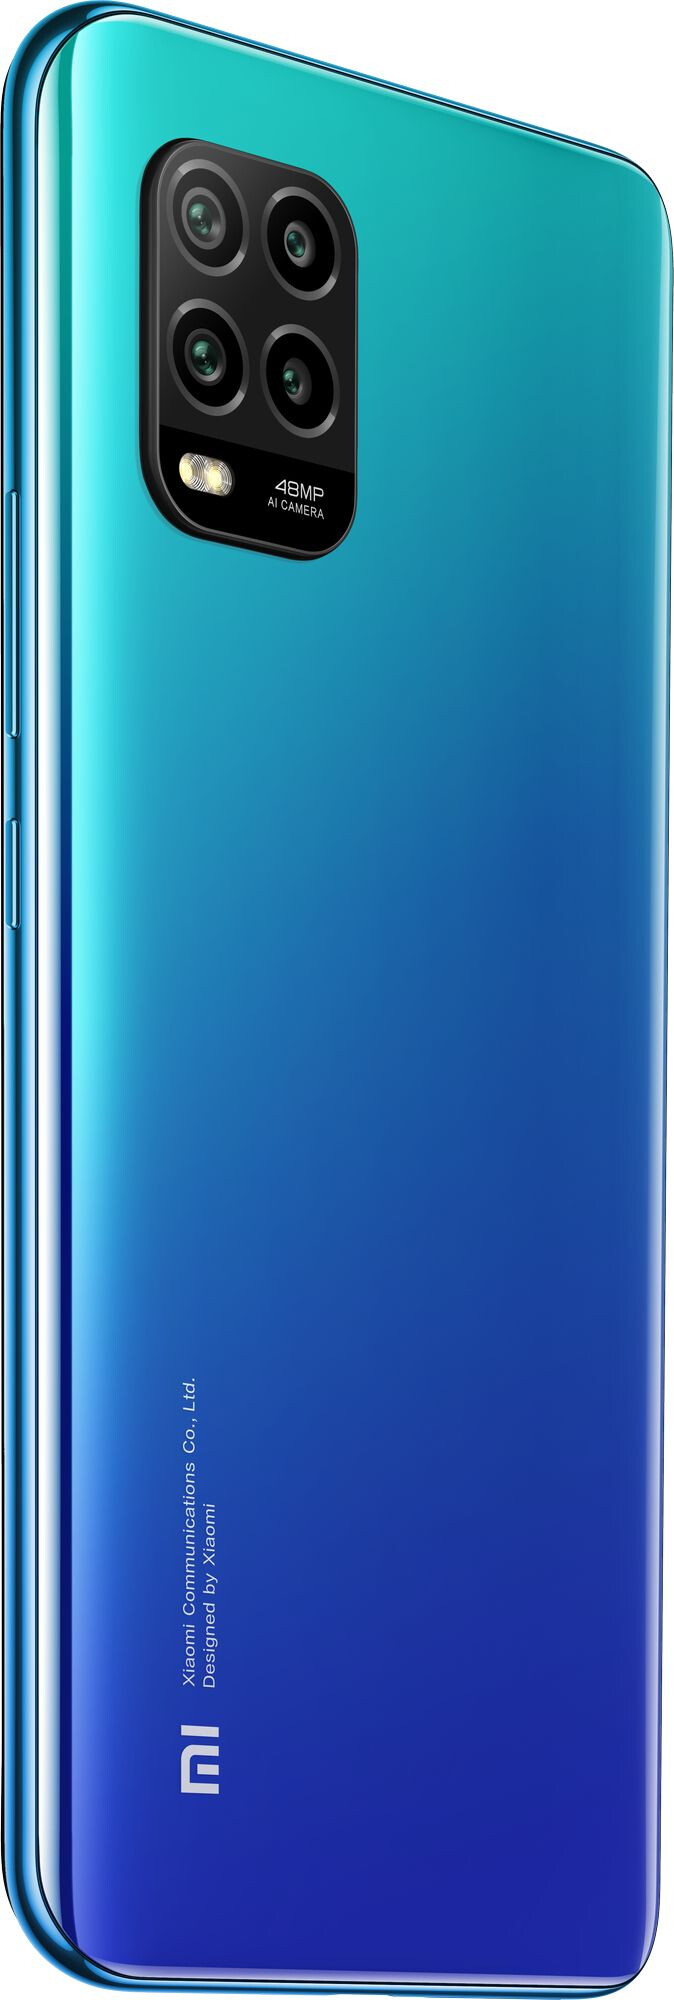 Mi 10 Lite okostelefon 6+64GB, Auróra kék